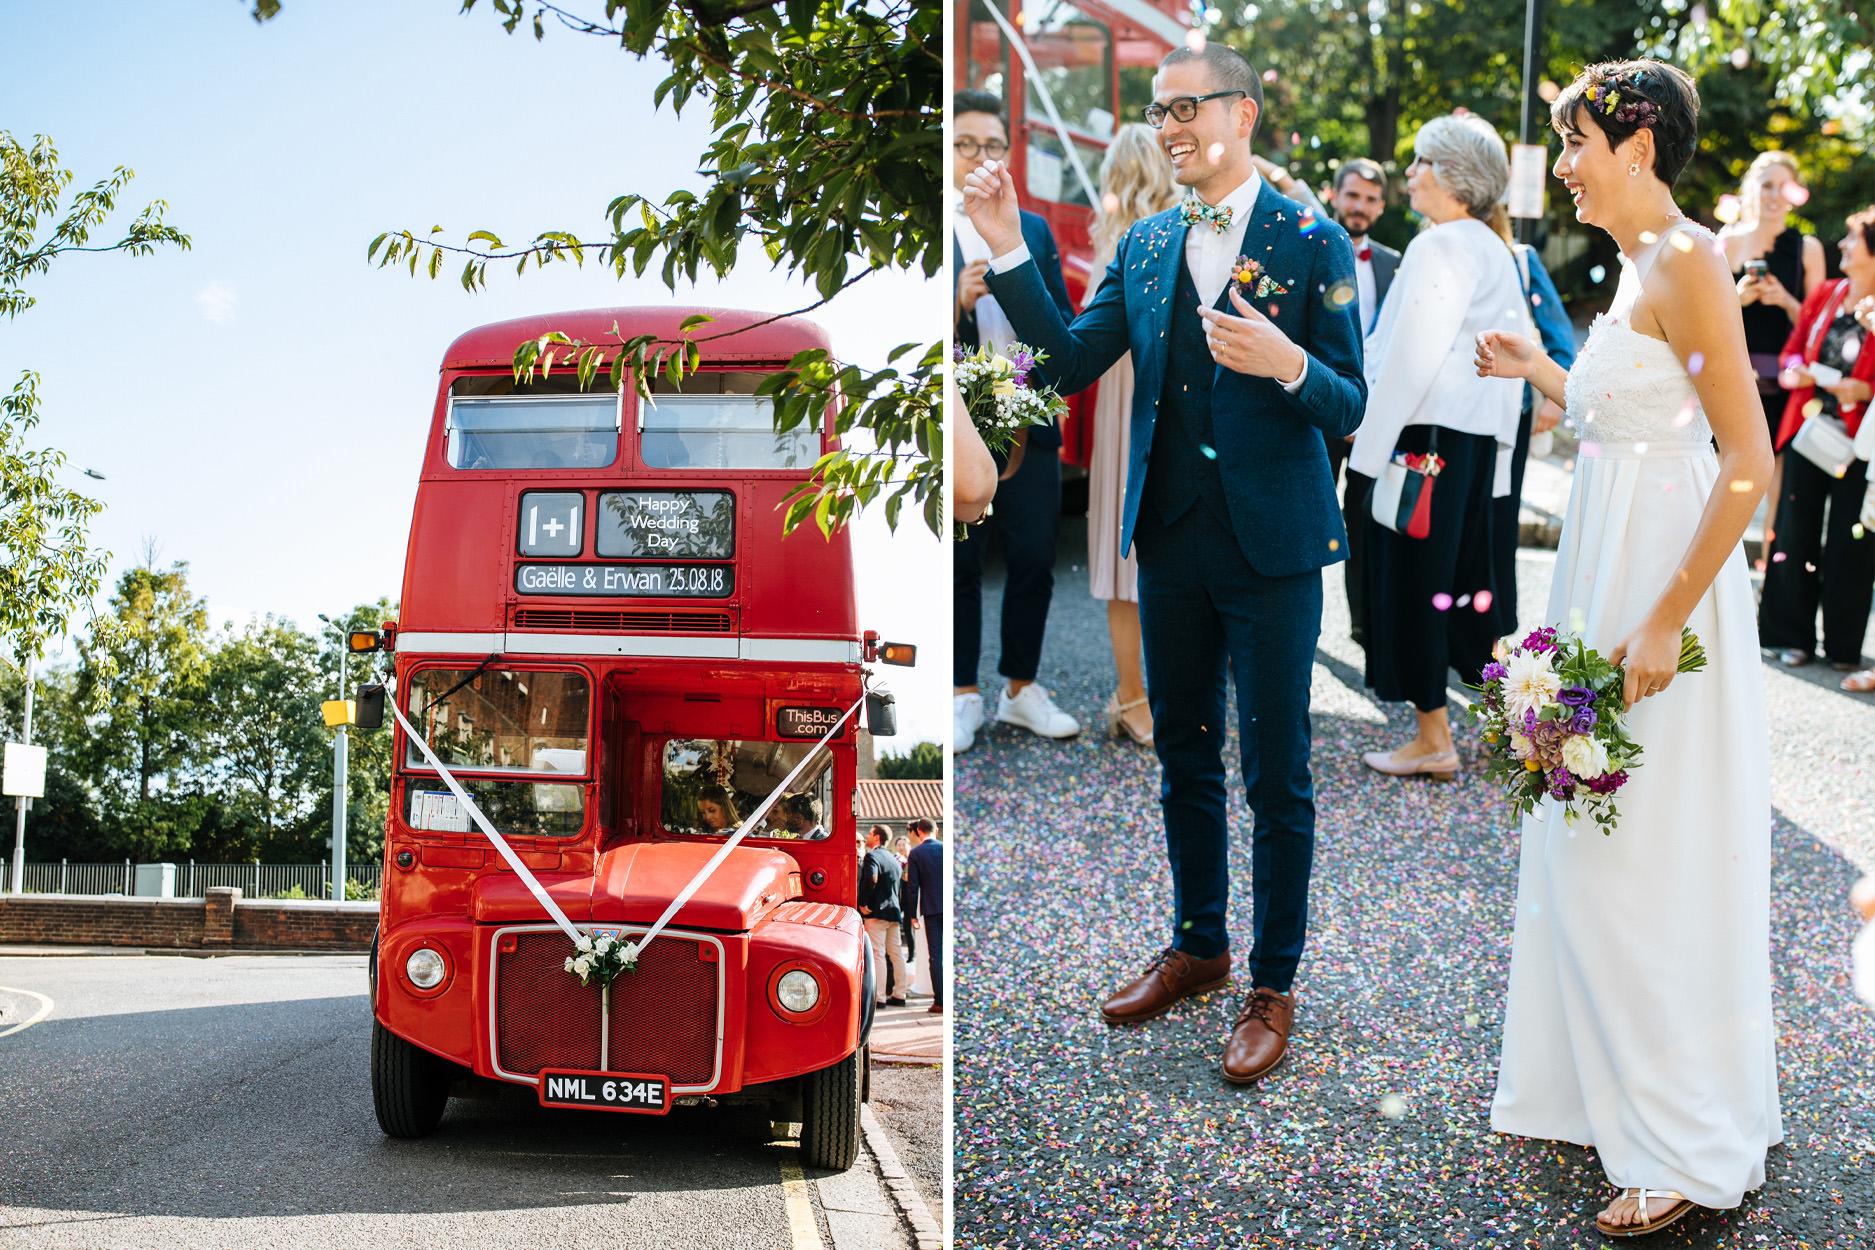 London routemaster at Hammersmith town hall wedding